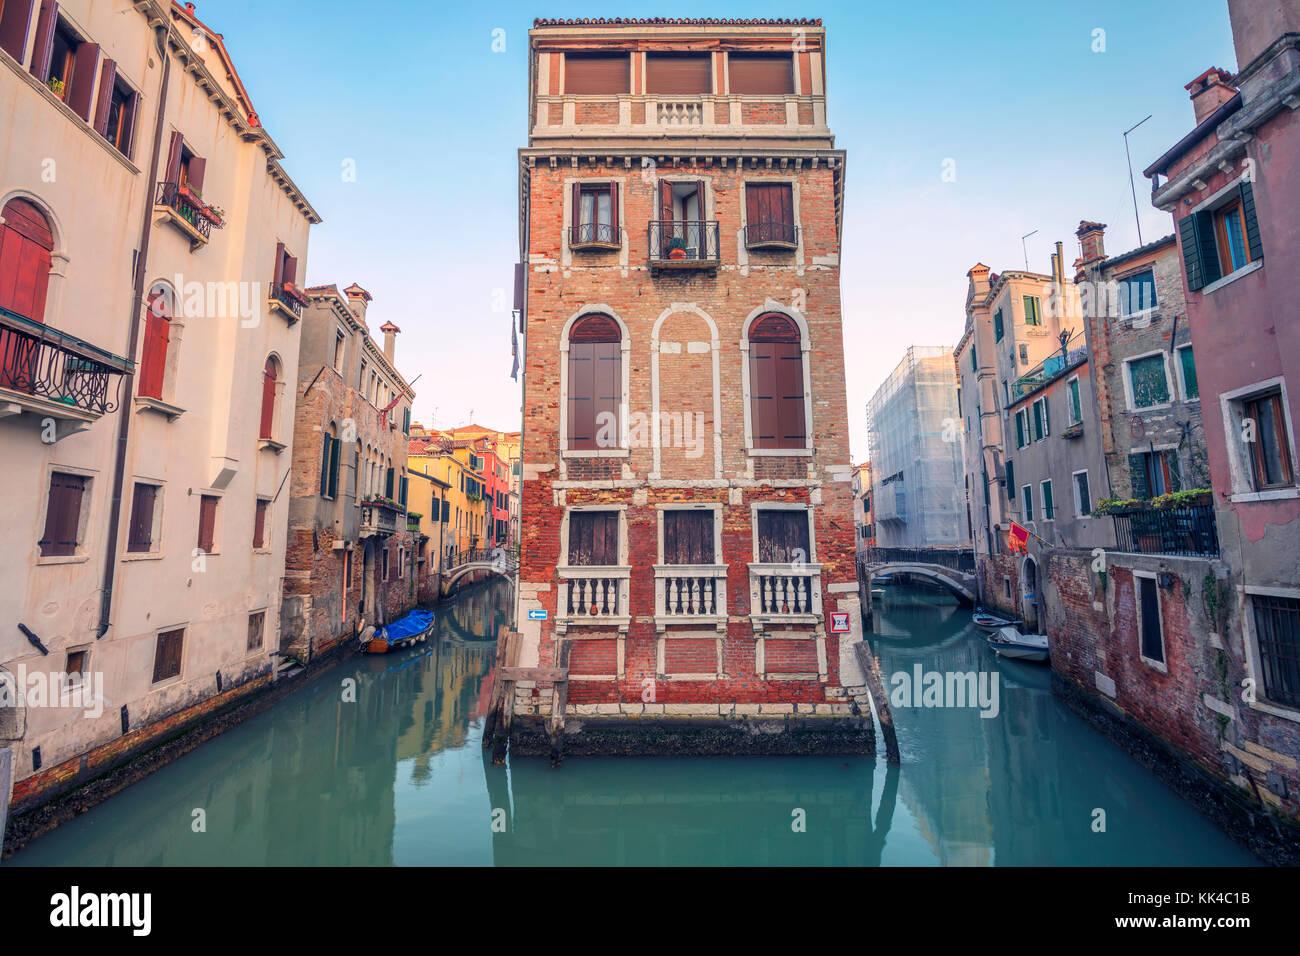 Venedig. stadtbild Bild der engen Kanäle in Venedig während des Sonnenuntergangs. Stockfoto